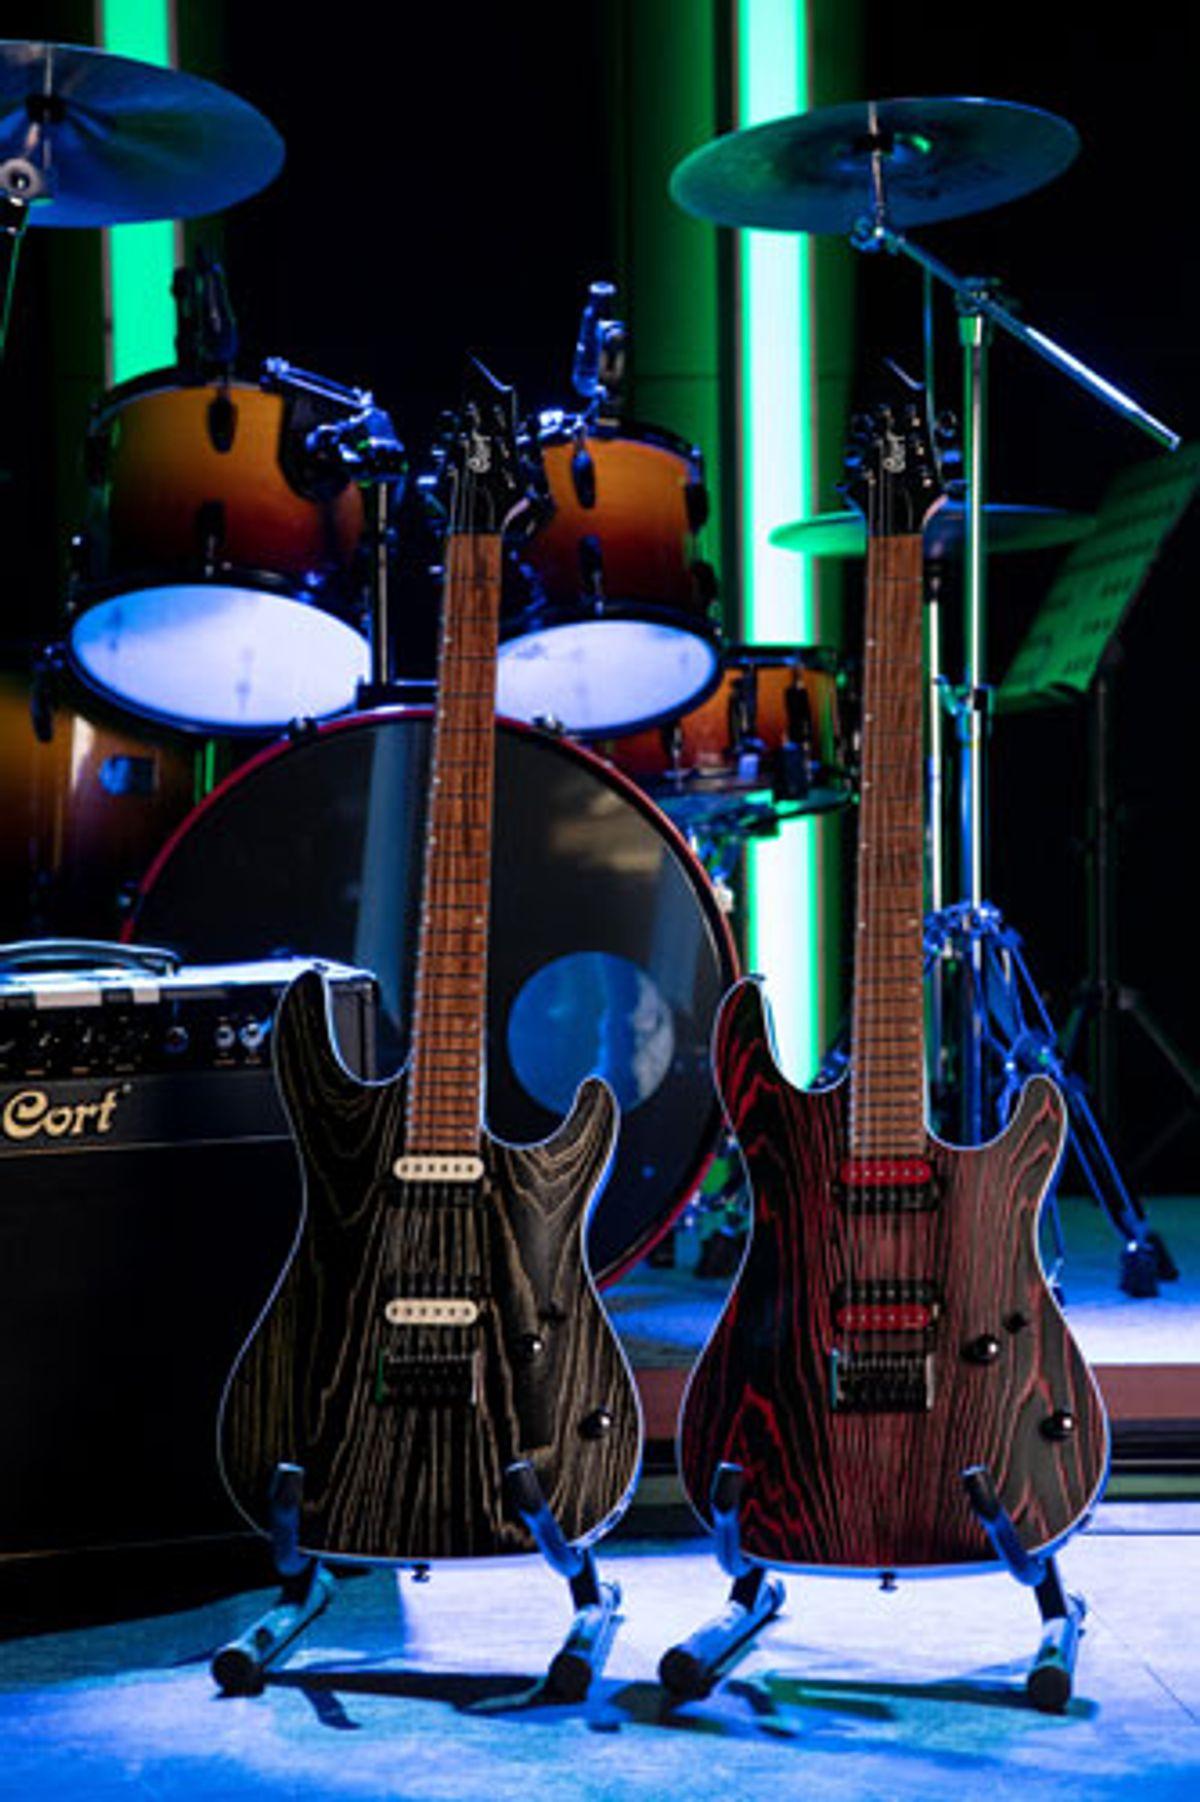 Cort Guitars Unveils the KX300 Etched